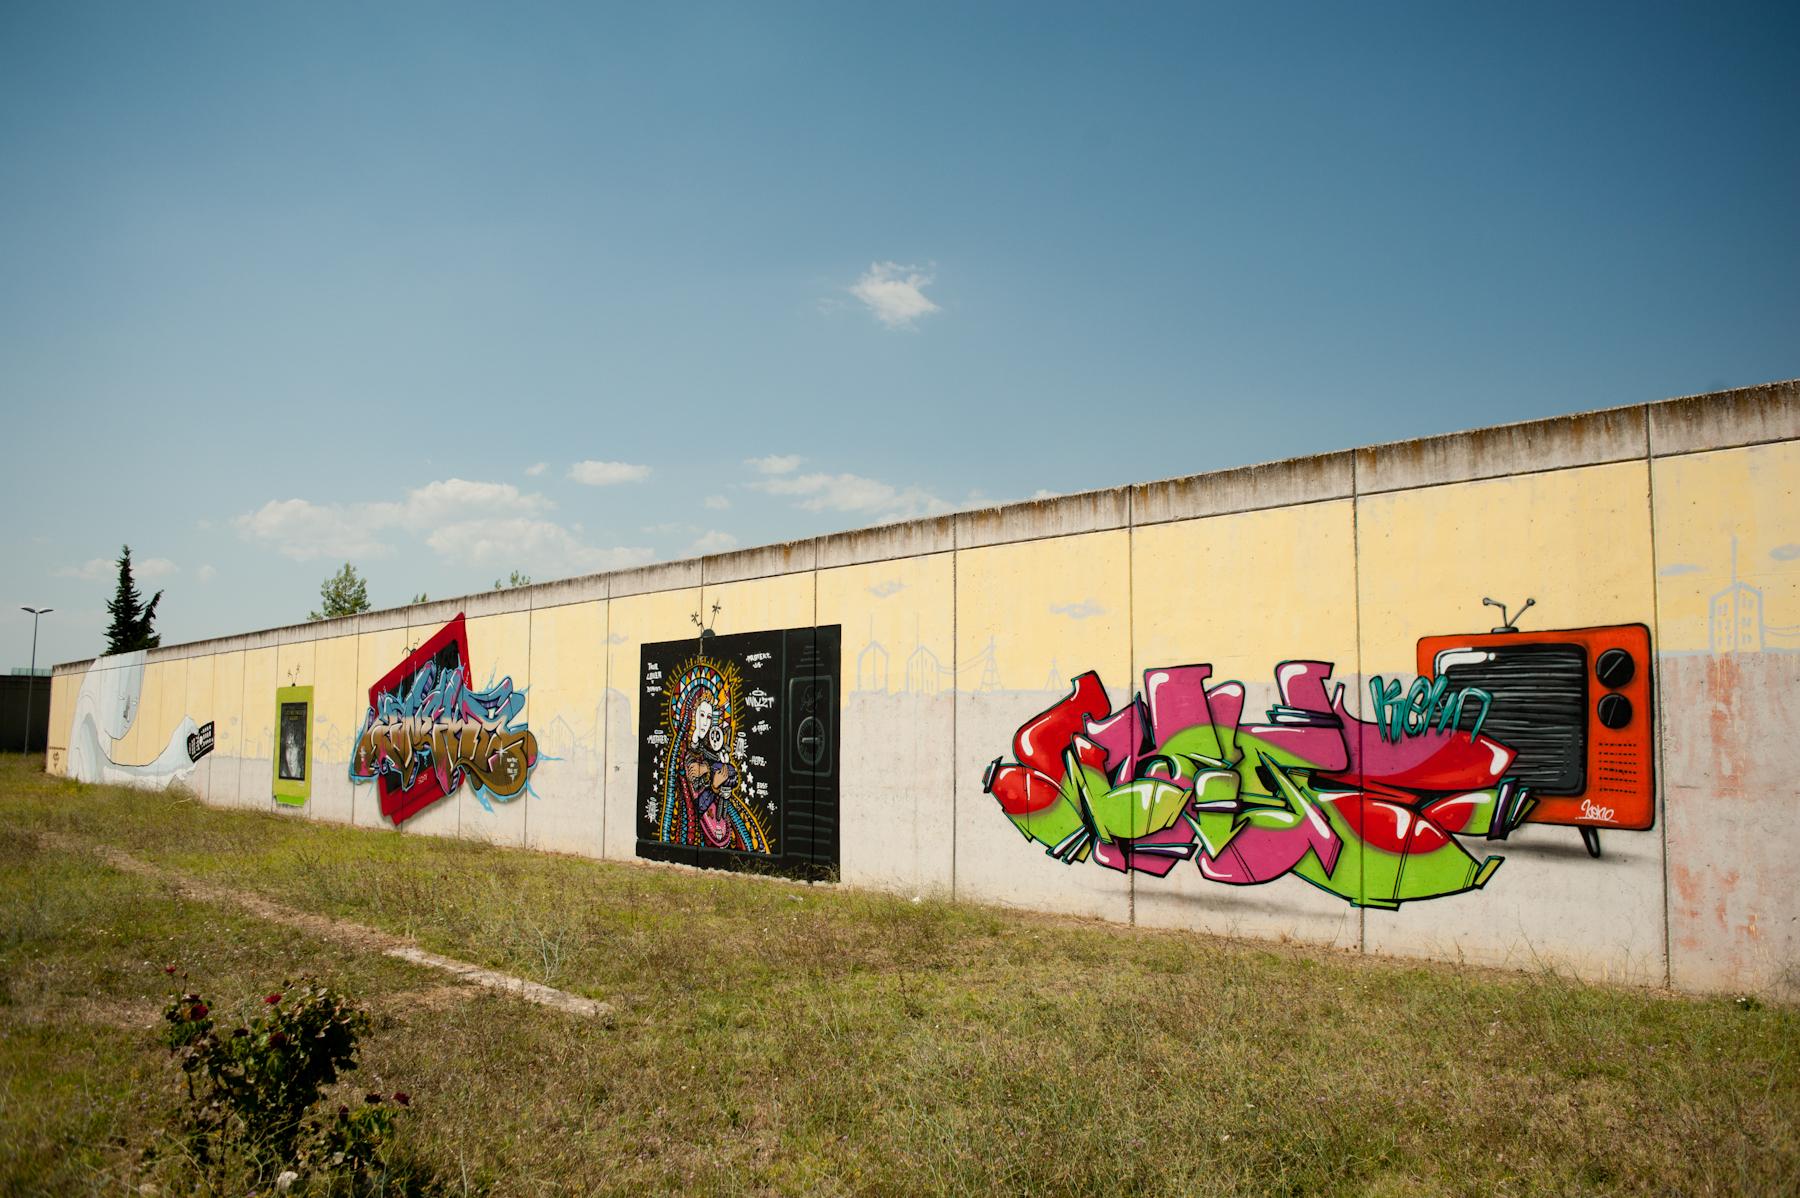 2012-10-22-DSC_4745.jpg